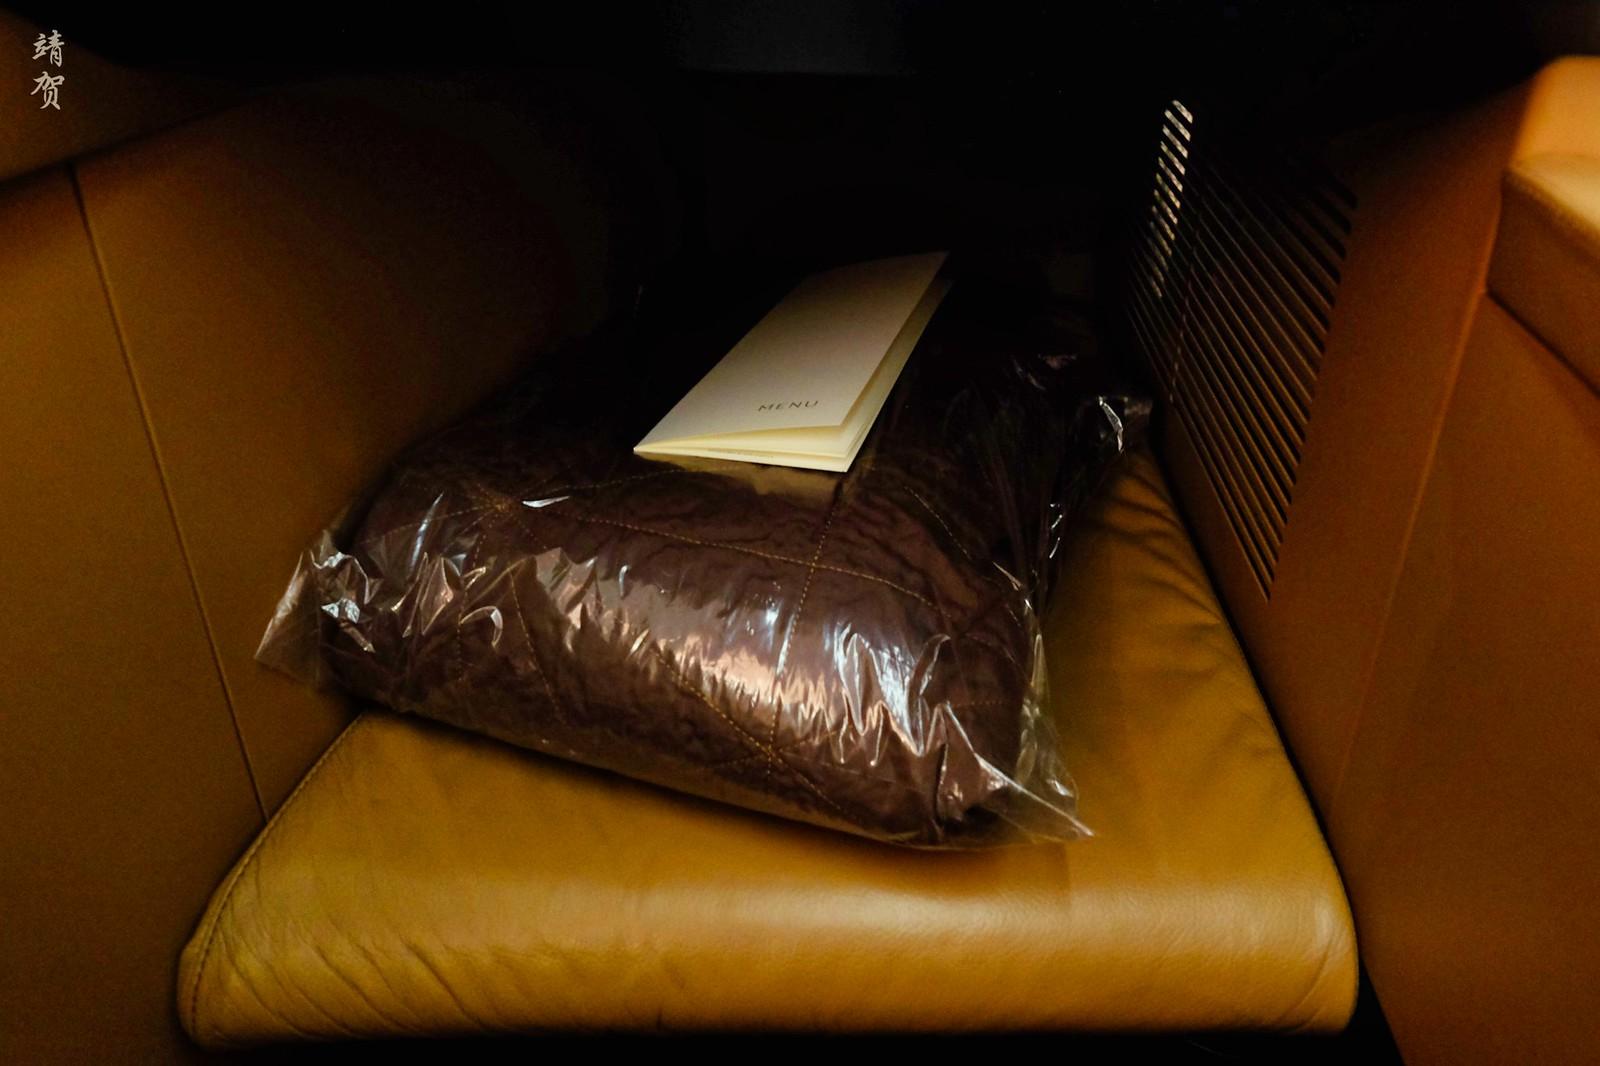 Blanket on the footrest